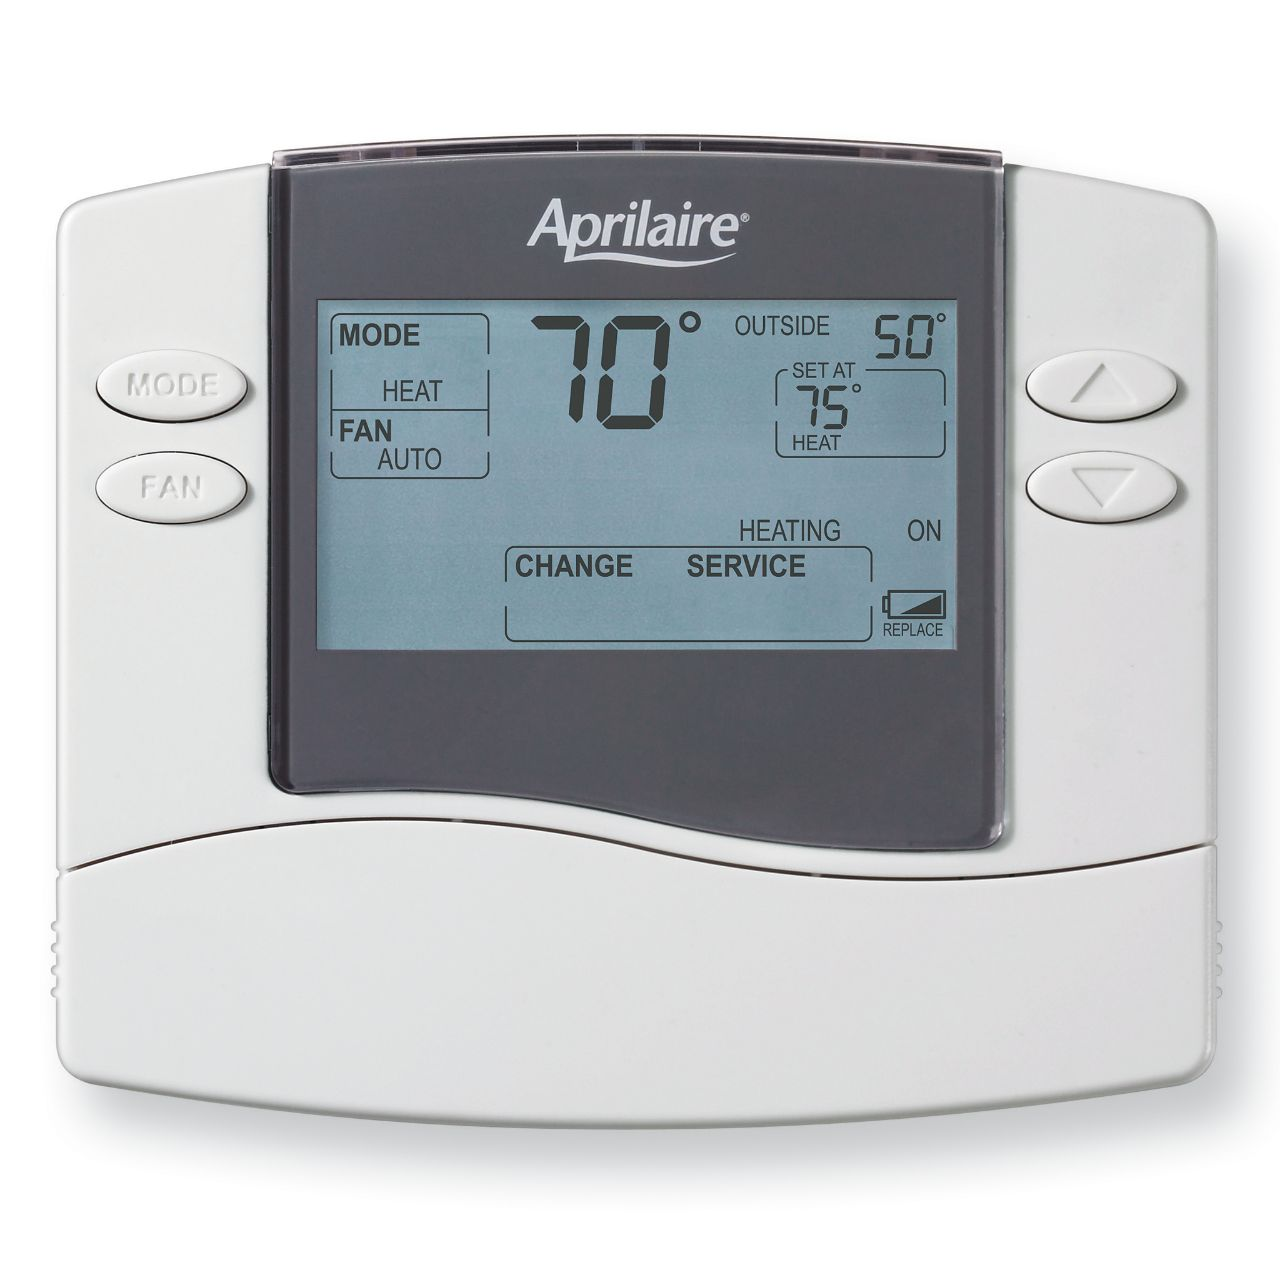 Aprilaire Aprilaire Non-programmable Universal, Multi-stage 2H/2C or 4H/2C Heat Pump Thermostat 2172797